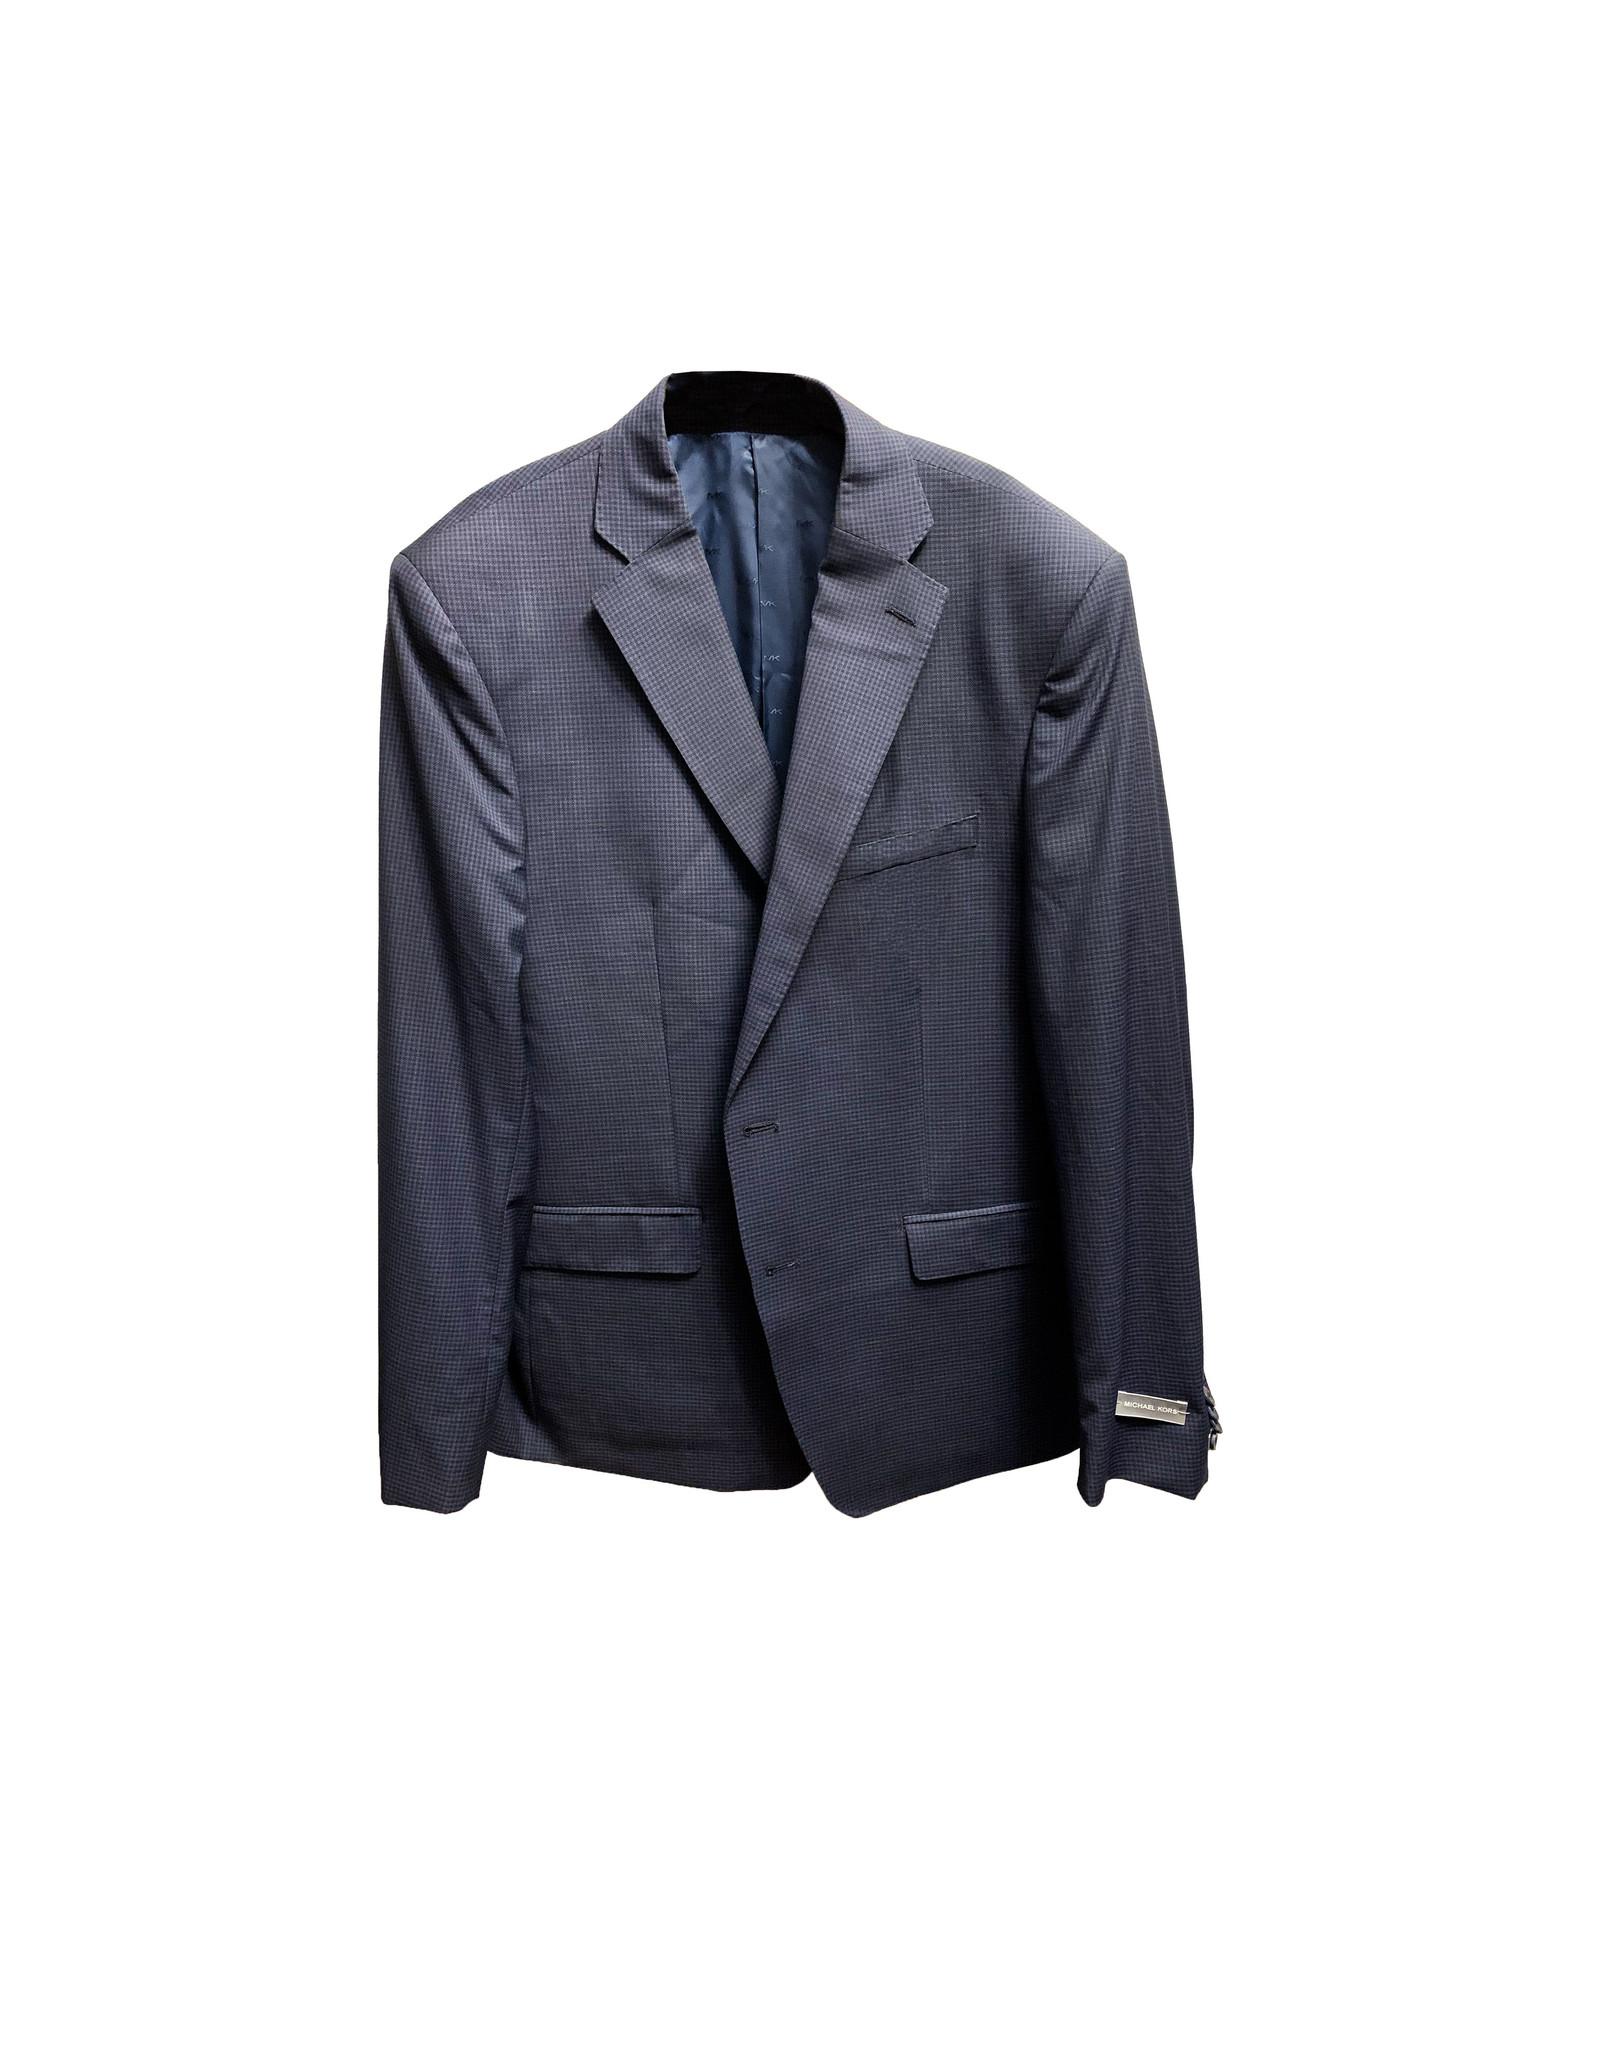 Michael Kors Michael Kors Wool-Blend Slim Fit Sports Jacket Size: 46R